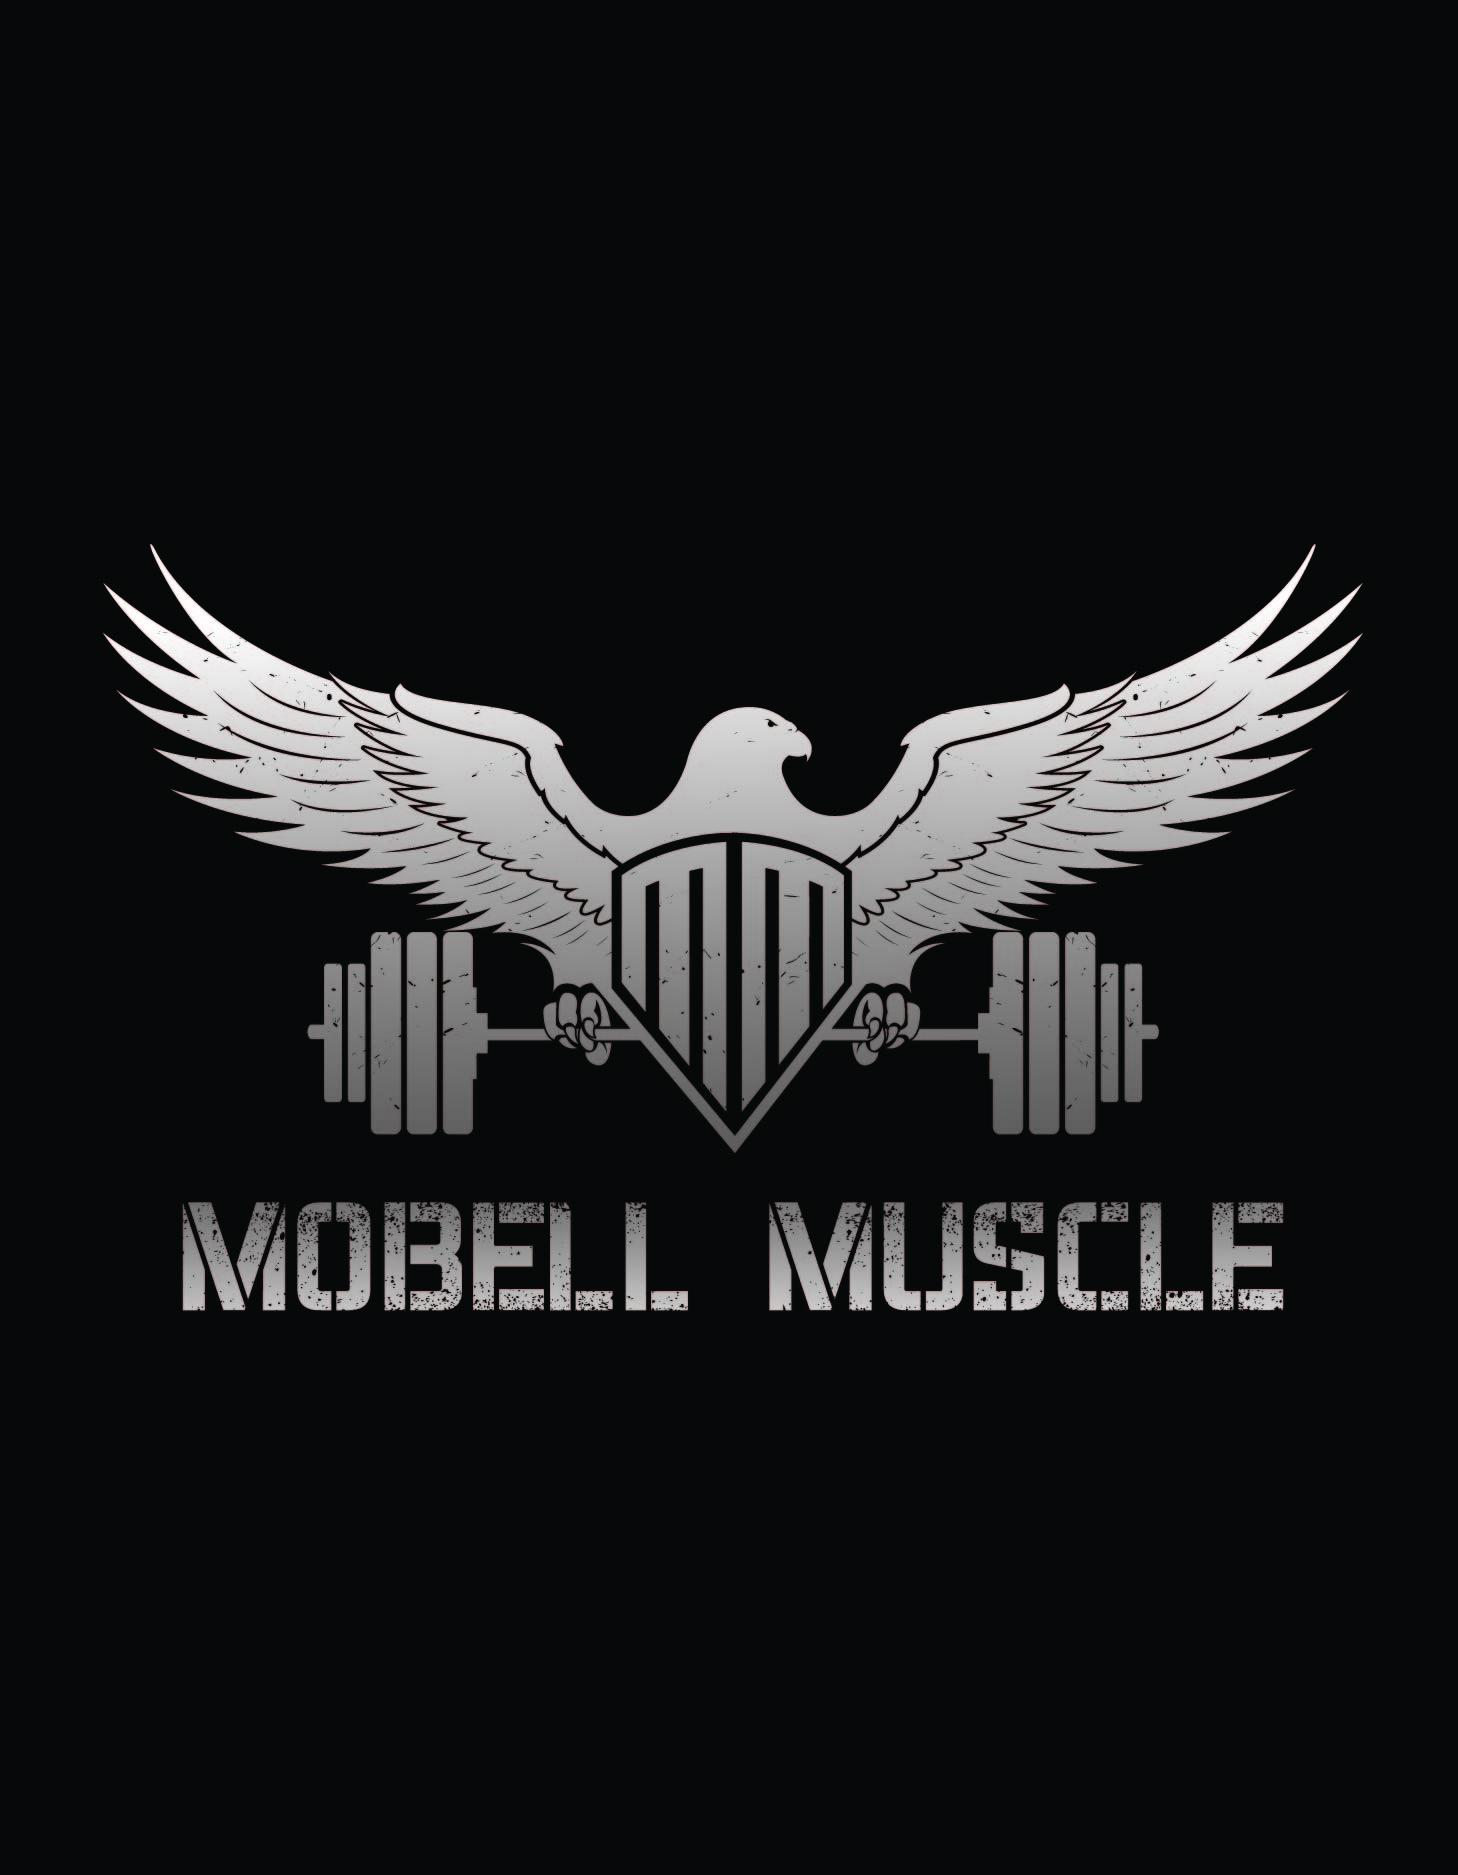 MOBELL MUSCLE SILVER.jpg